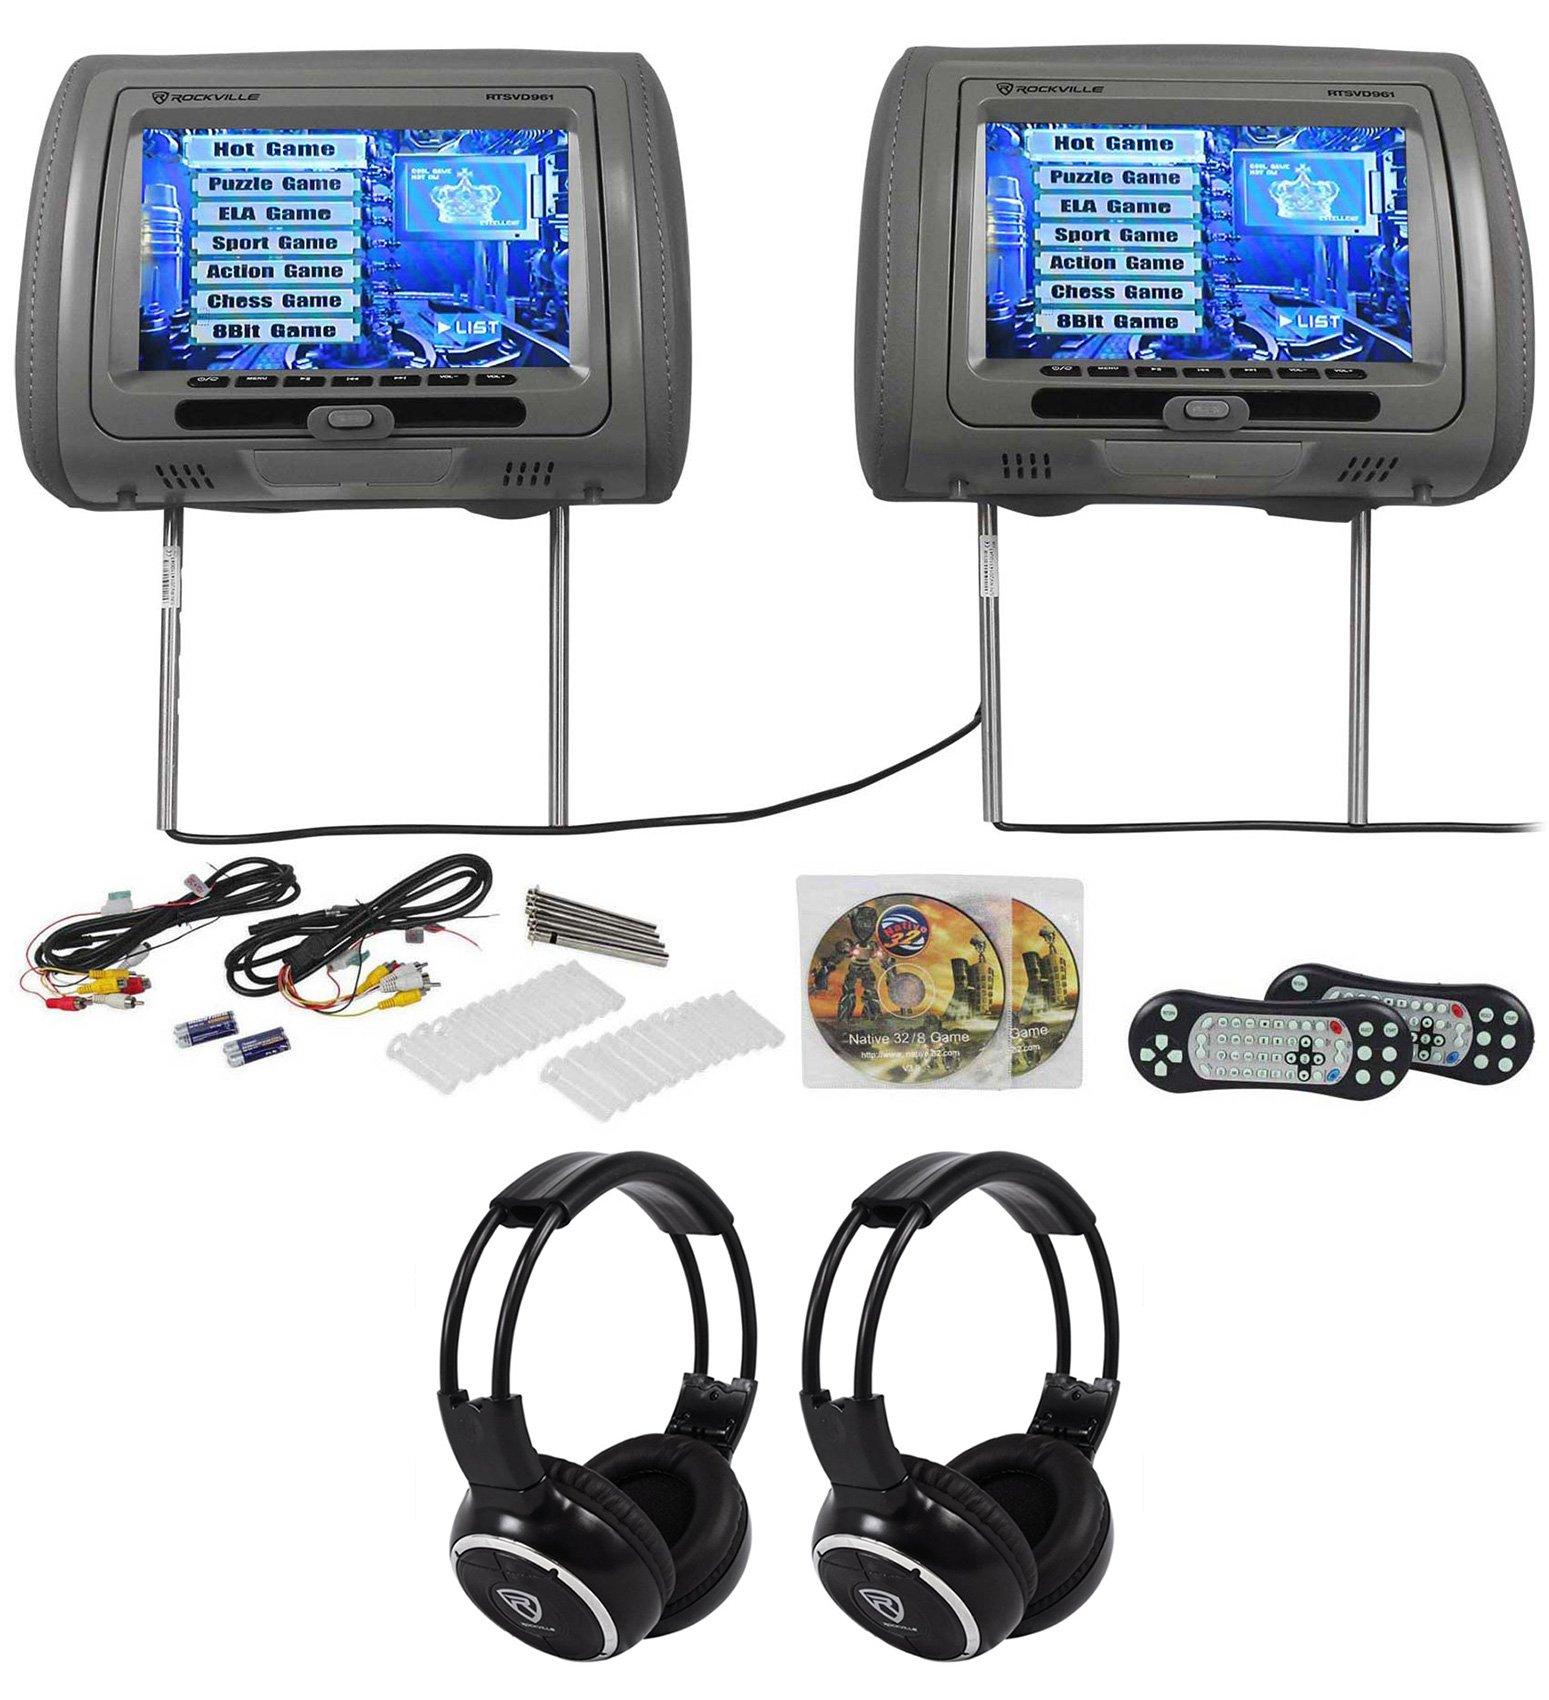 Rockville RTSVD961-GR 9 Gray Touchscreen DVD/HDMI Headrest Monitors+Headphones by Rockville (Image #1)